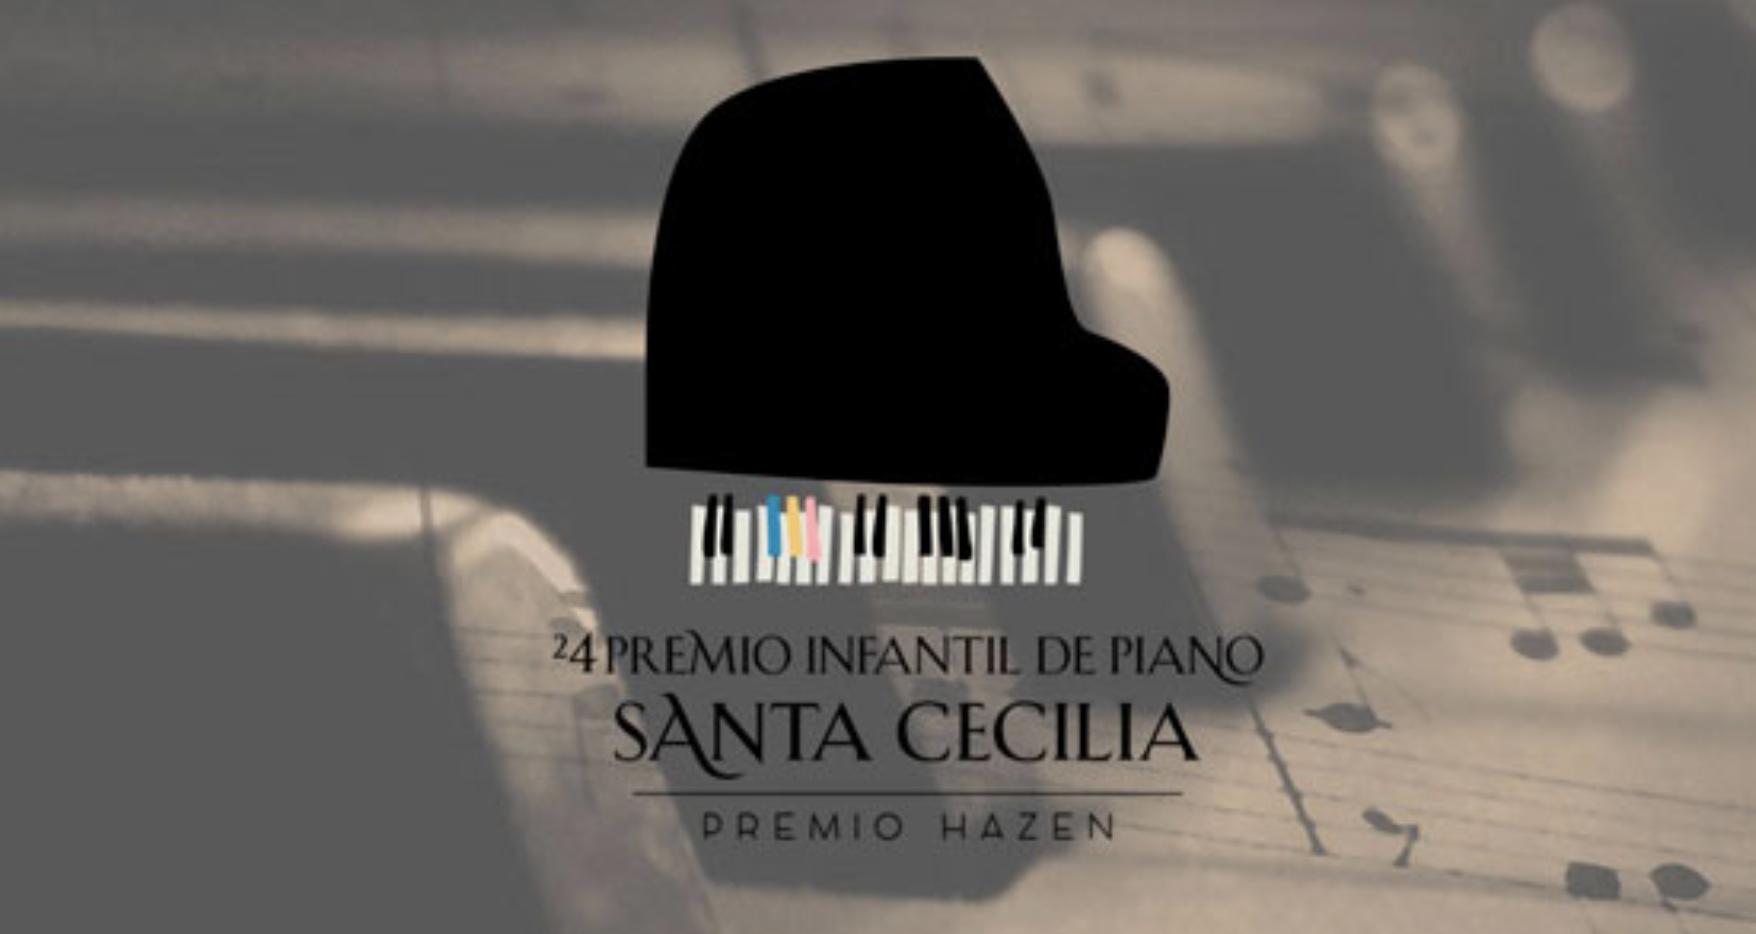 24-premio-infantil-piano-santa-cecilia-hazen